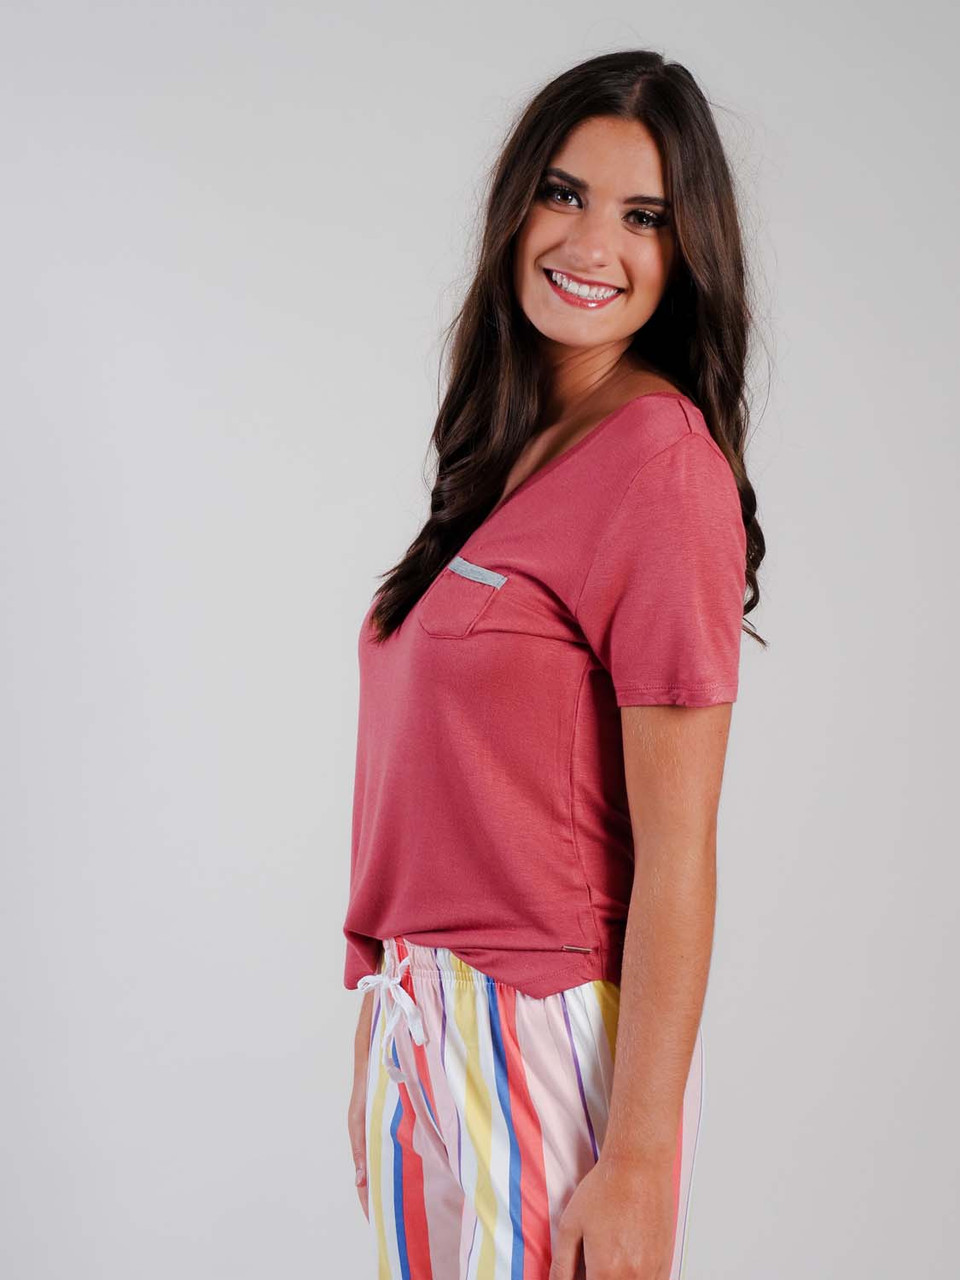 salmon color lounge shirt with small pocket